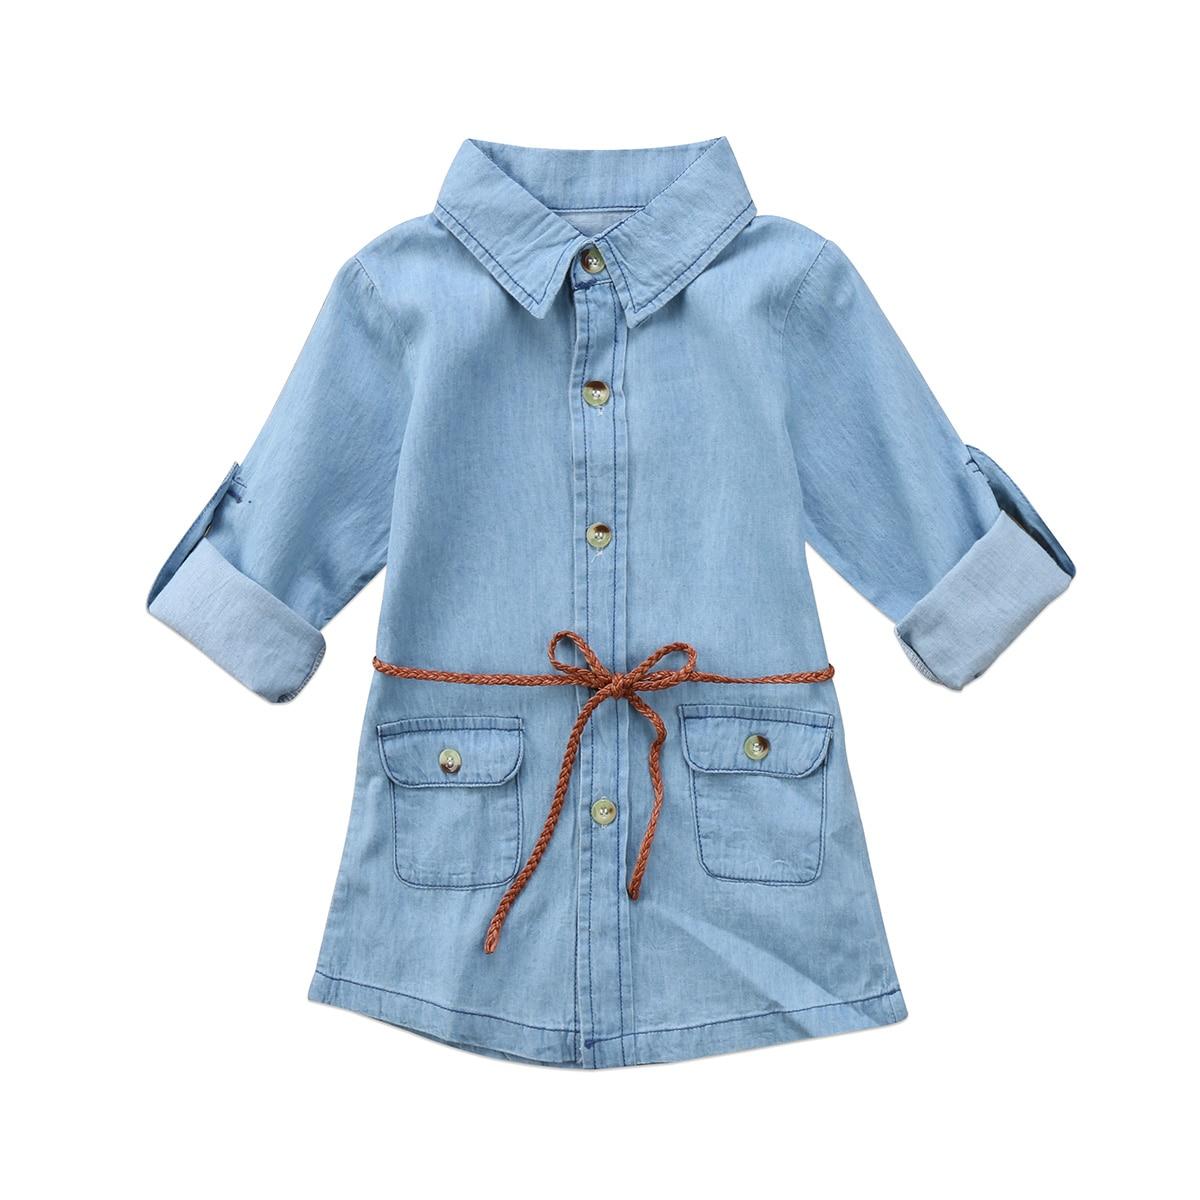 Emmababy New Bran Baby Kids Girl Denim Short Mini Dress Jean Long Sleeve Casual Party Shirt Dress